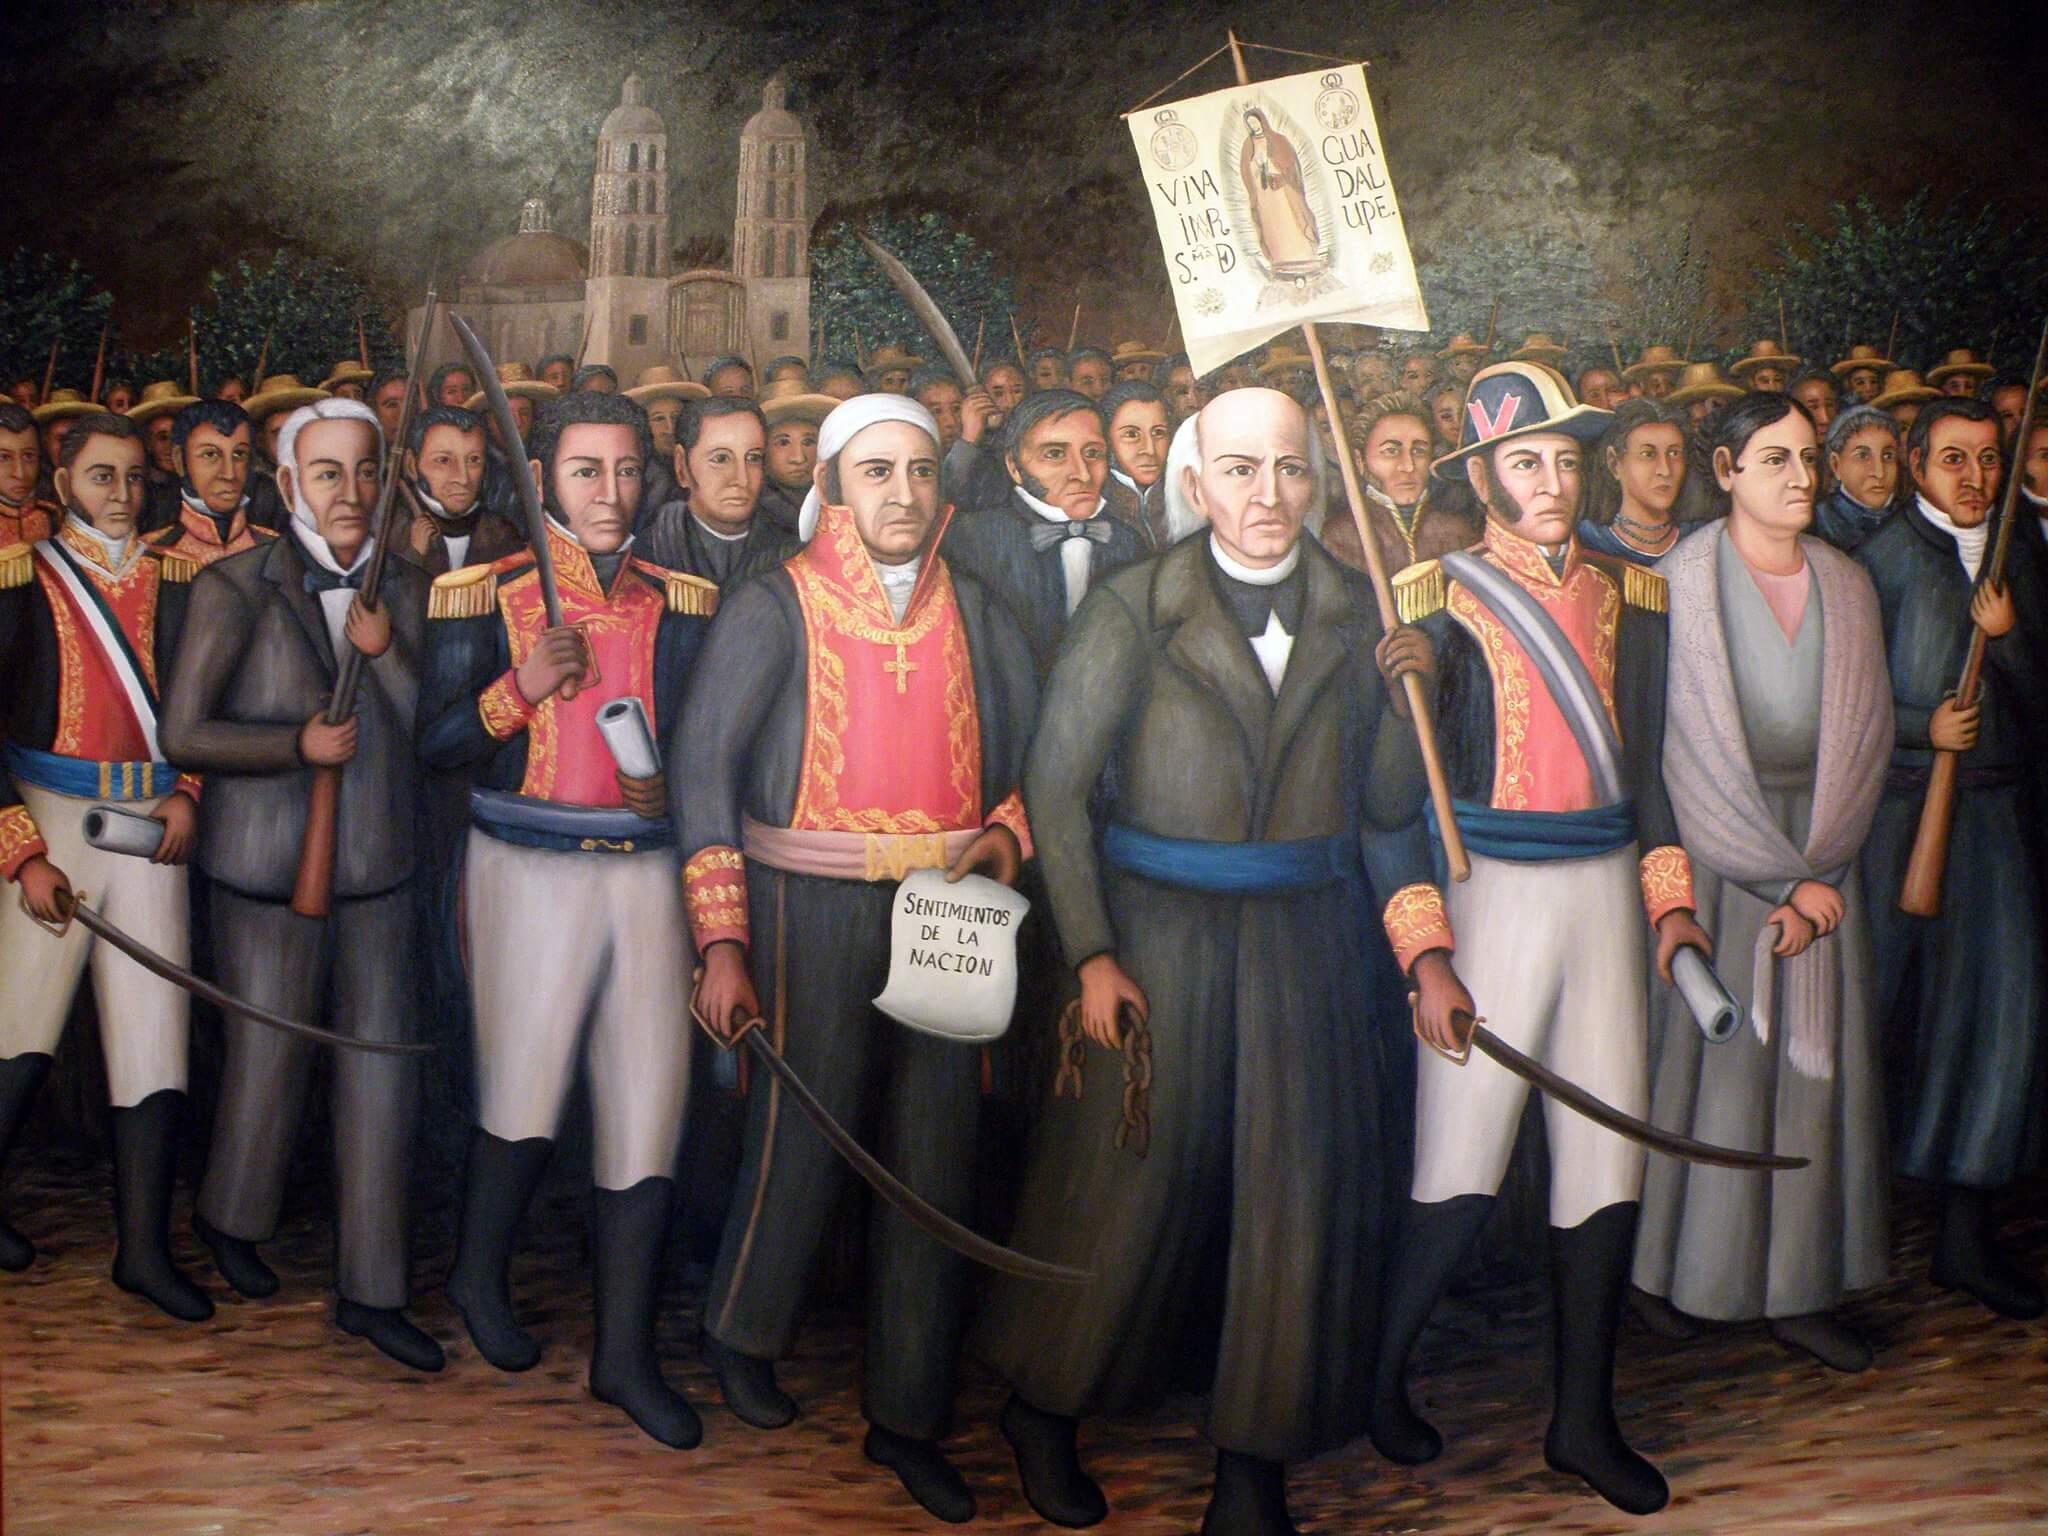 Miguel Hidalgo, Vicente Guerrero, Jose Maria Morelos, Pavon and others, author Eduardo Francisco Vazquez Murillo, by flickr, CC-BY-SA-2